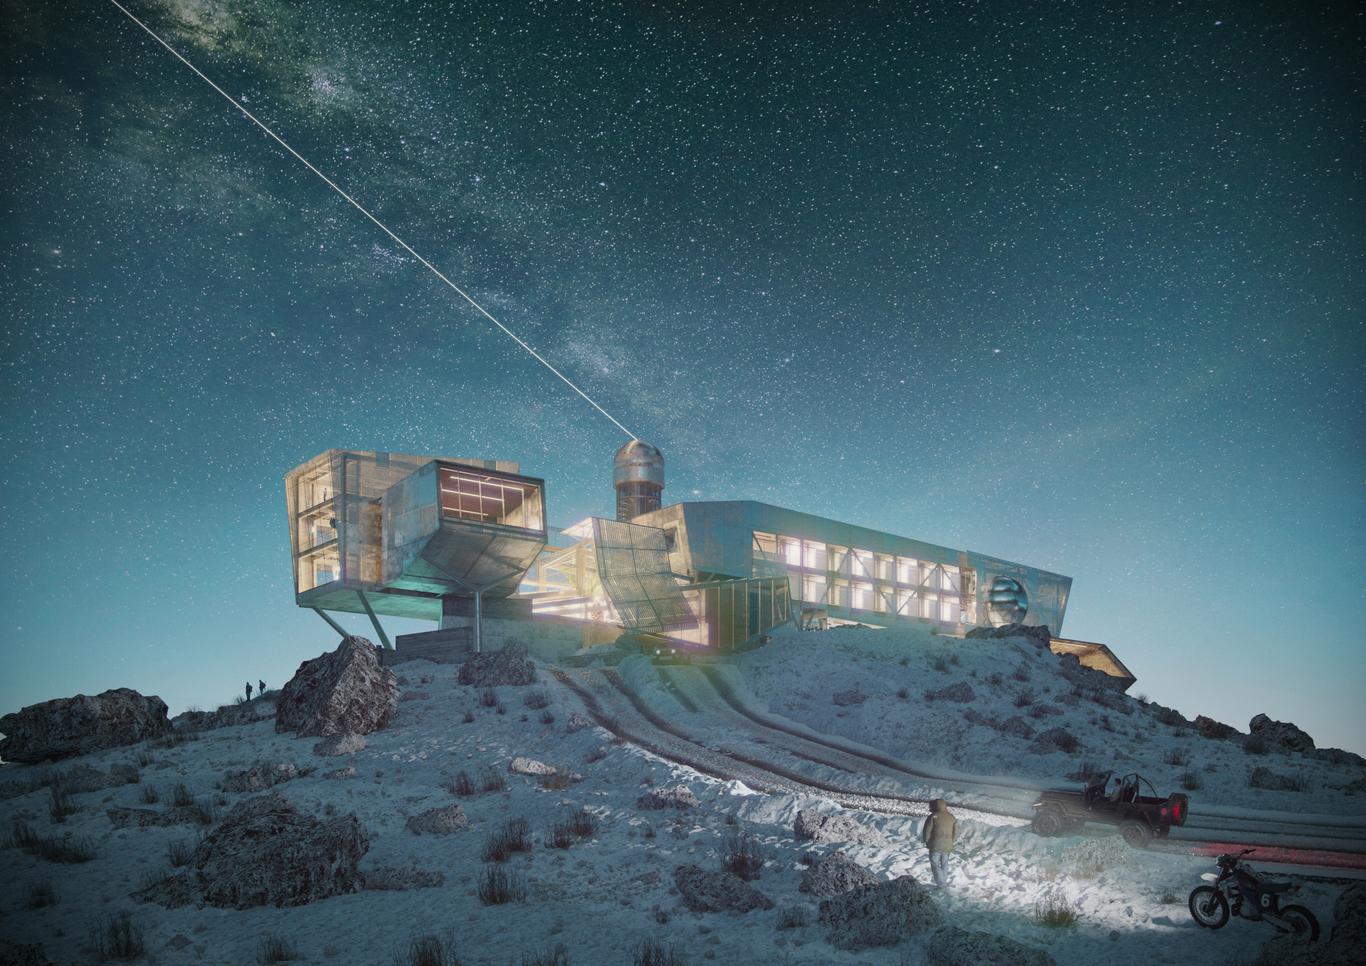 Fazarqs astronomic center sl 1 7c598608 t0h4